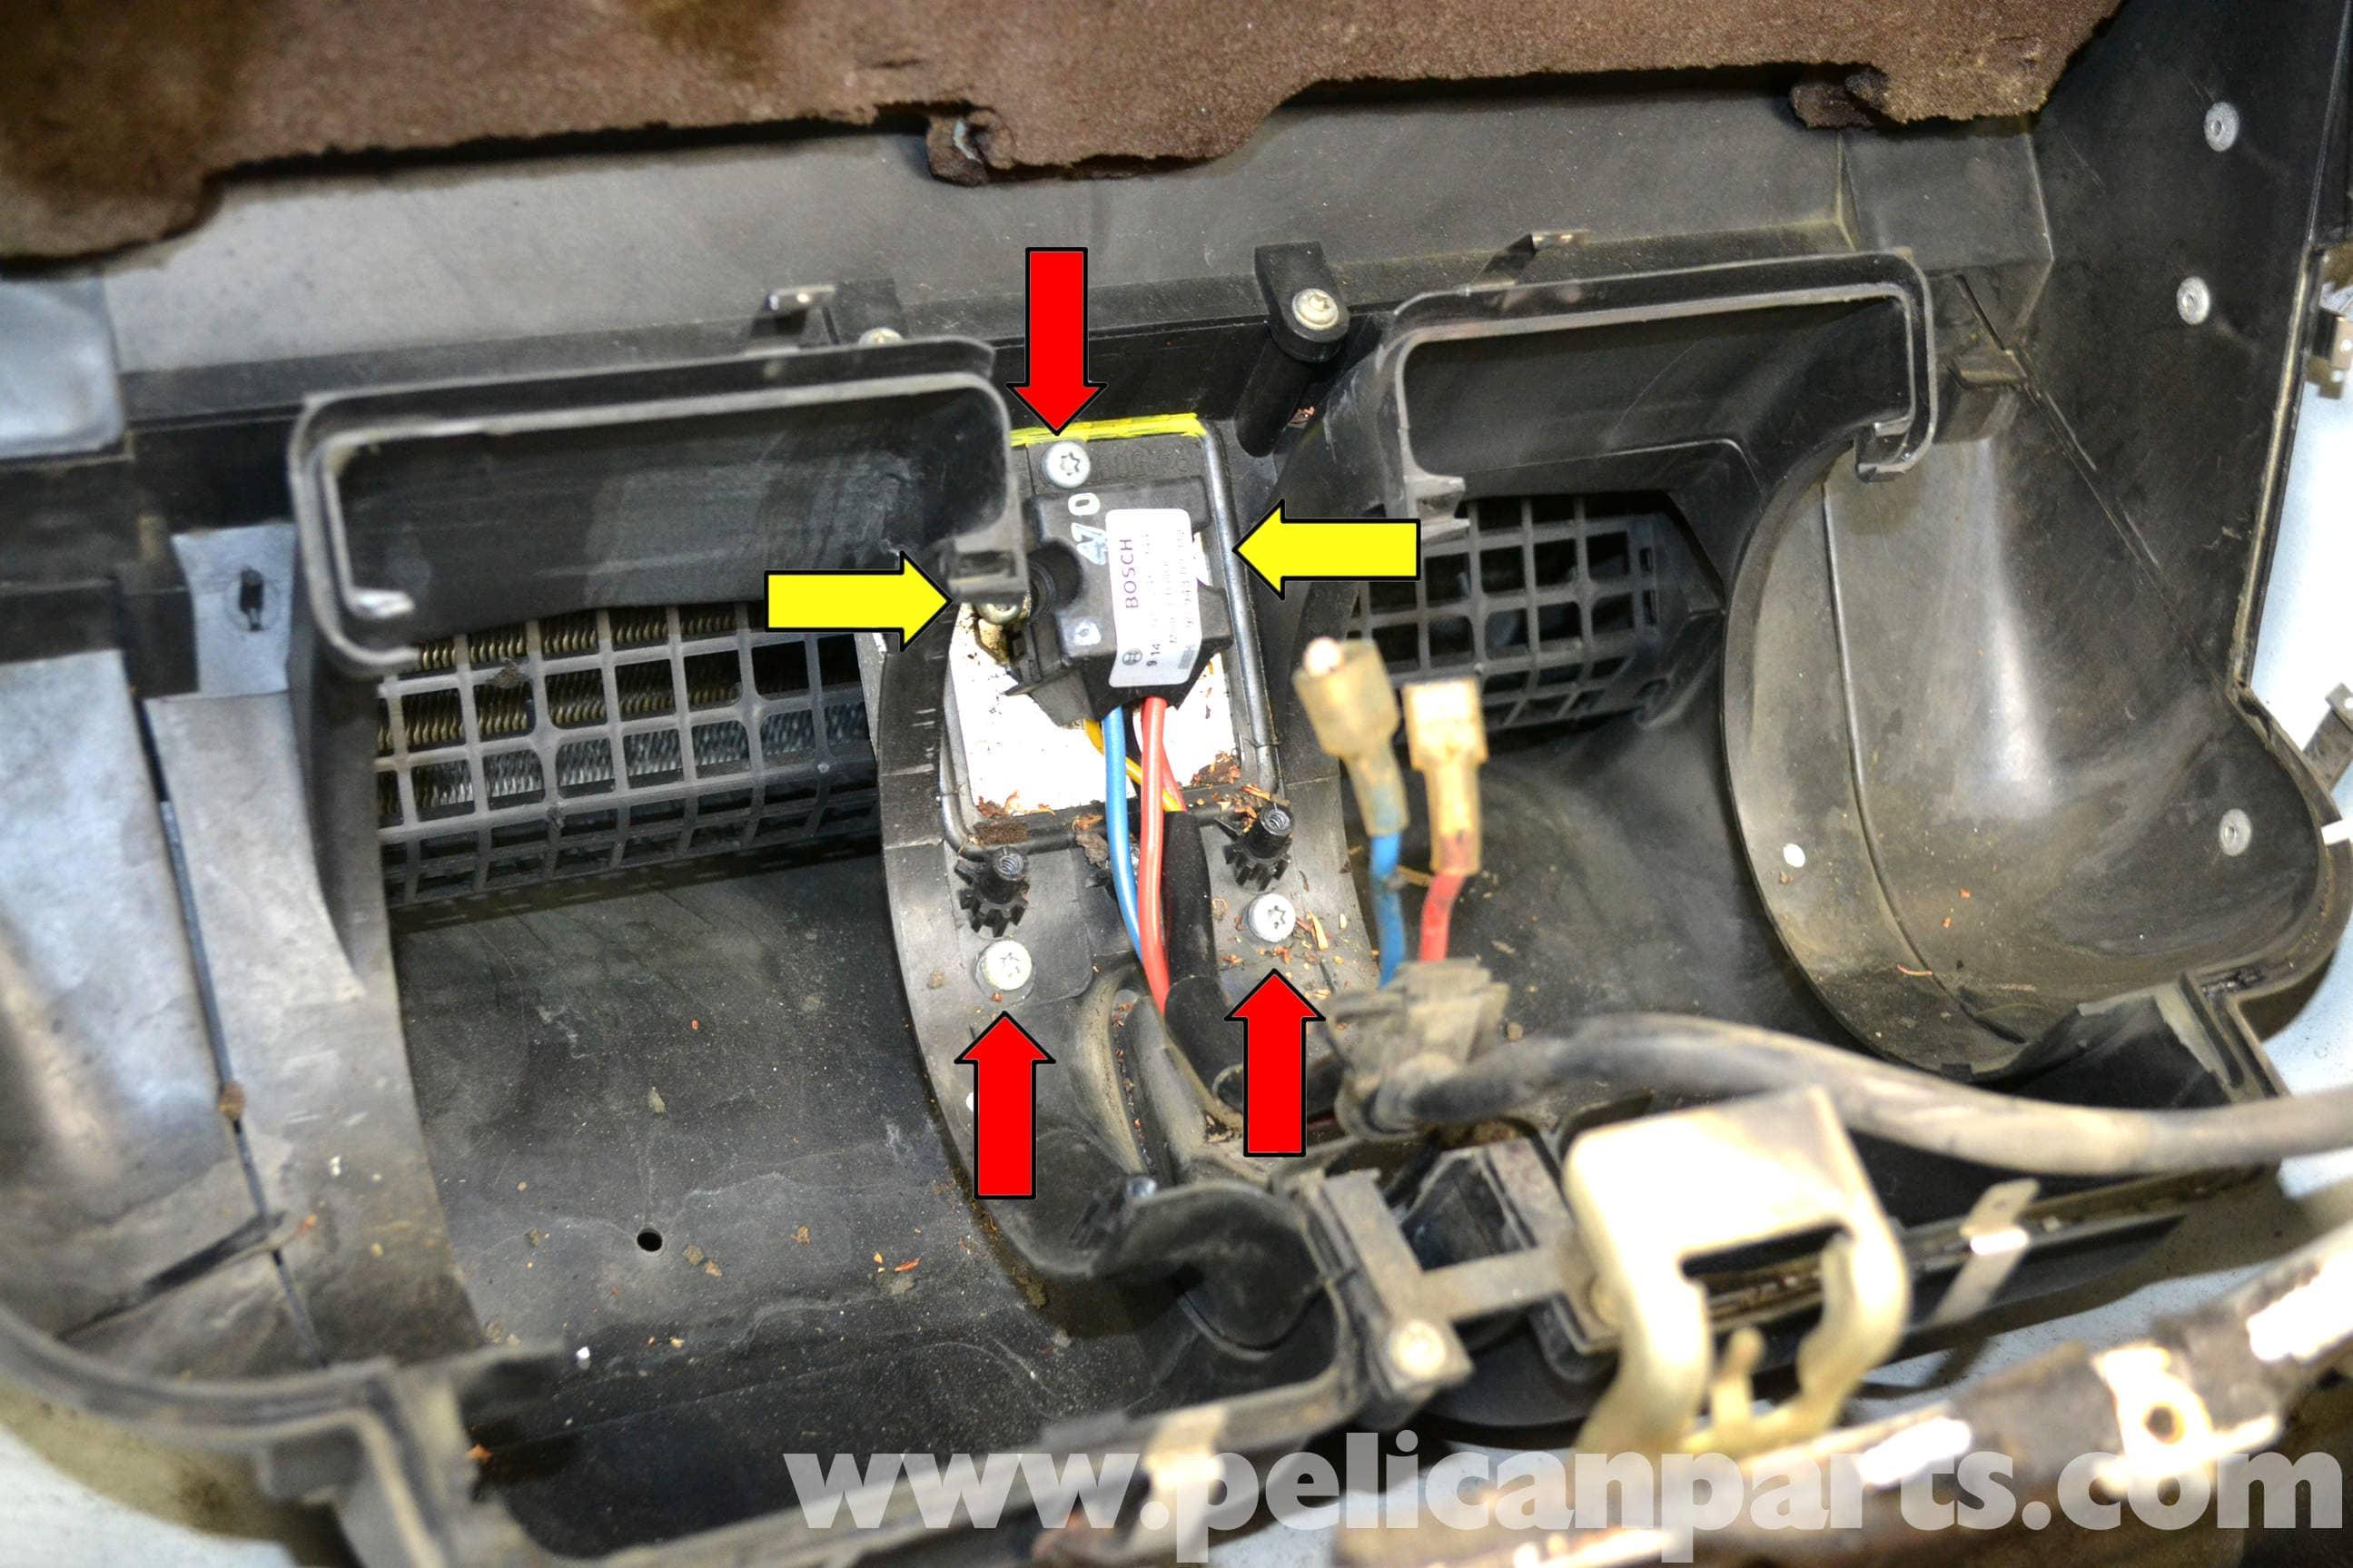 E60 Tail Light Wiring Diagram Mercedes Benz W124 Hvac Resistor Replacement 1986 1995 E